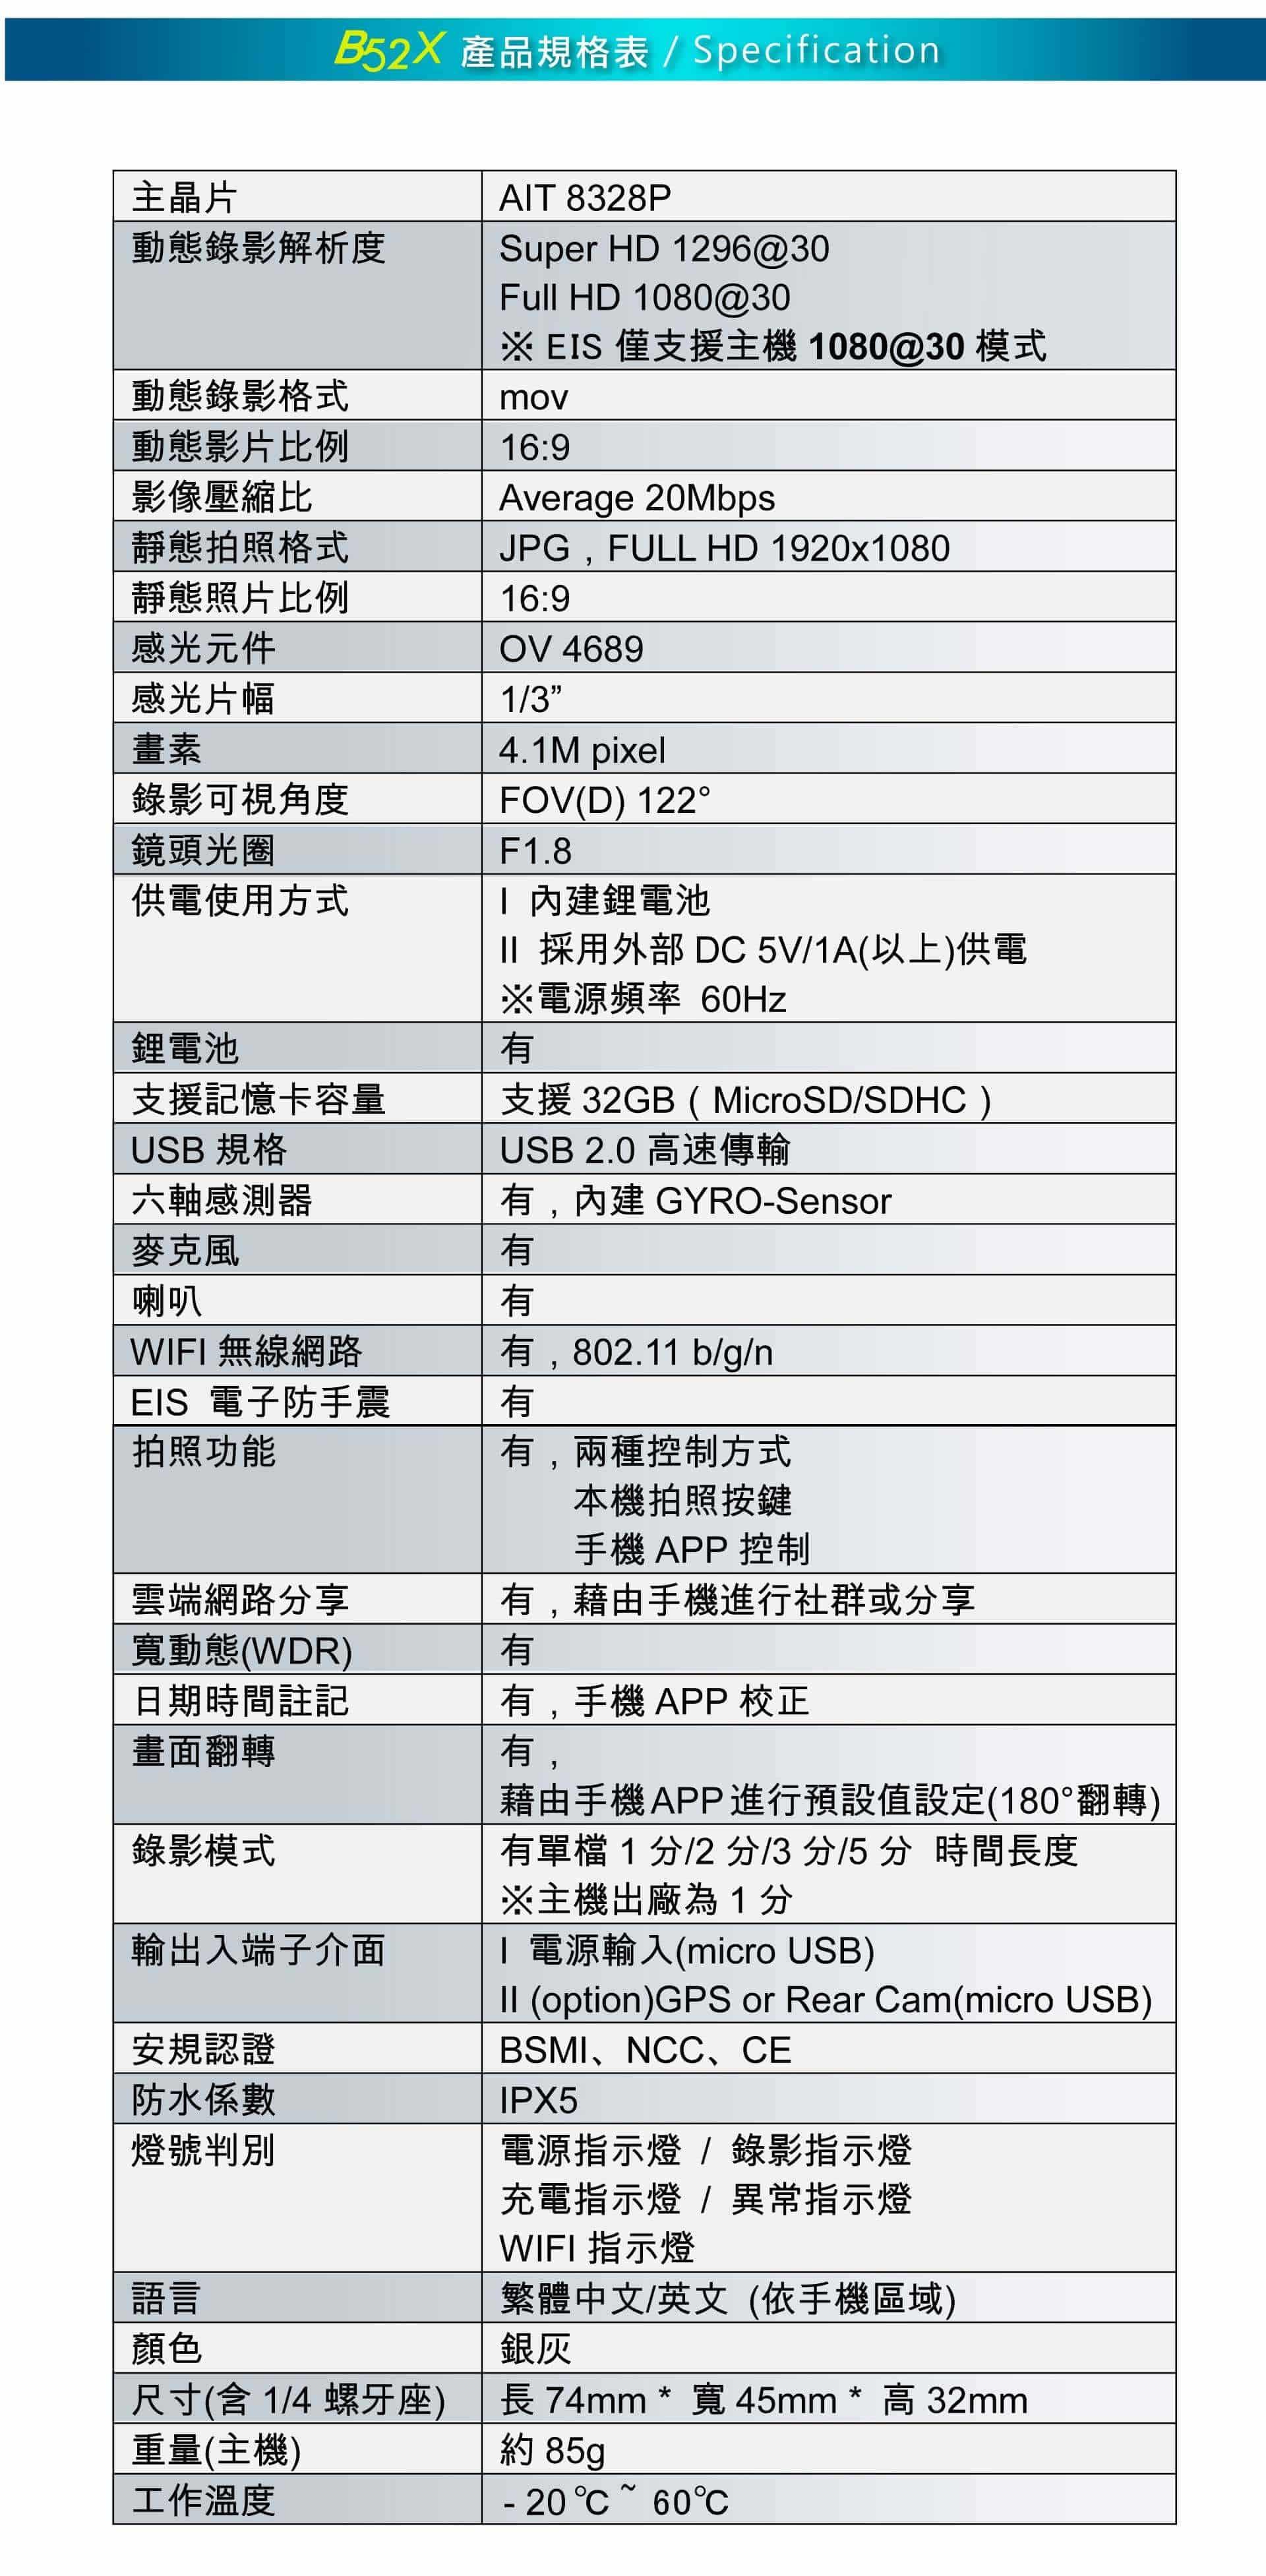 proimages/product/pro-01/pro-01-002/B52X/B52X-23.jpg